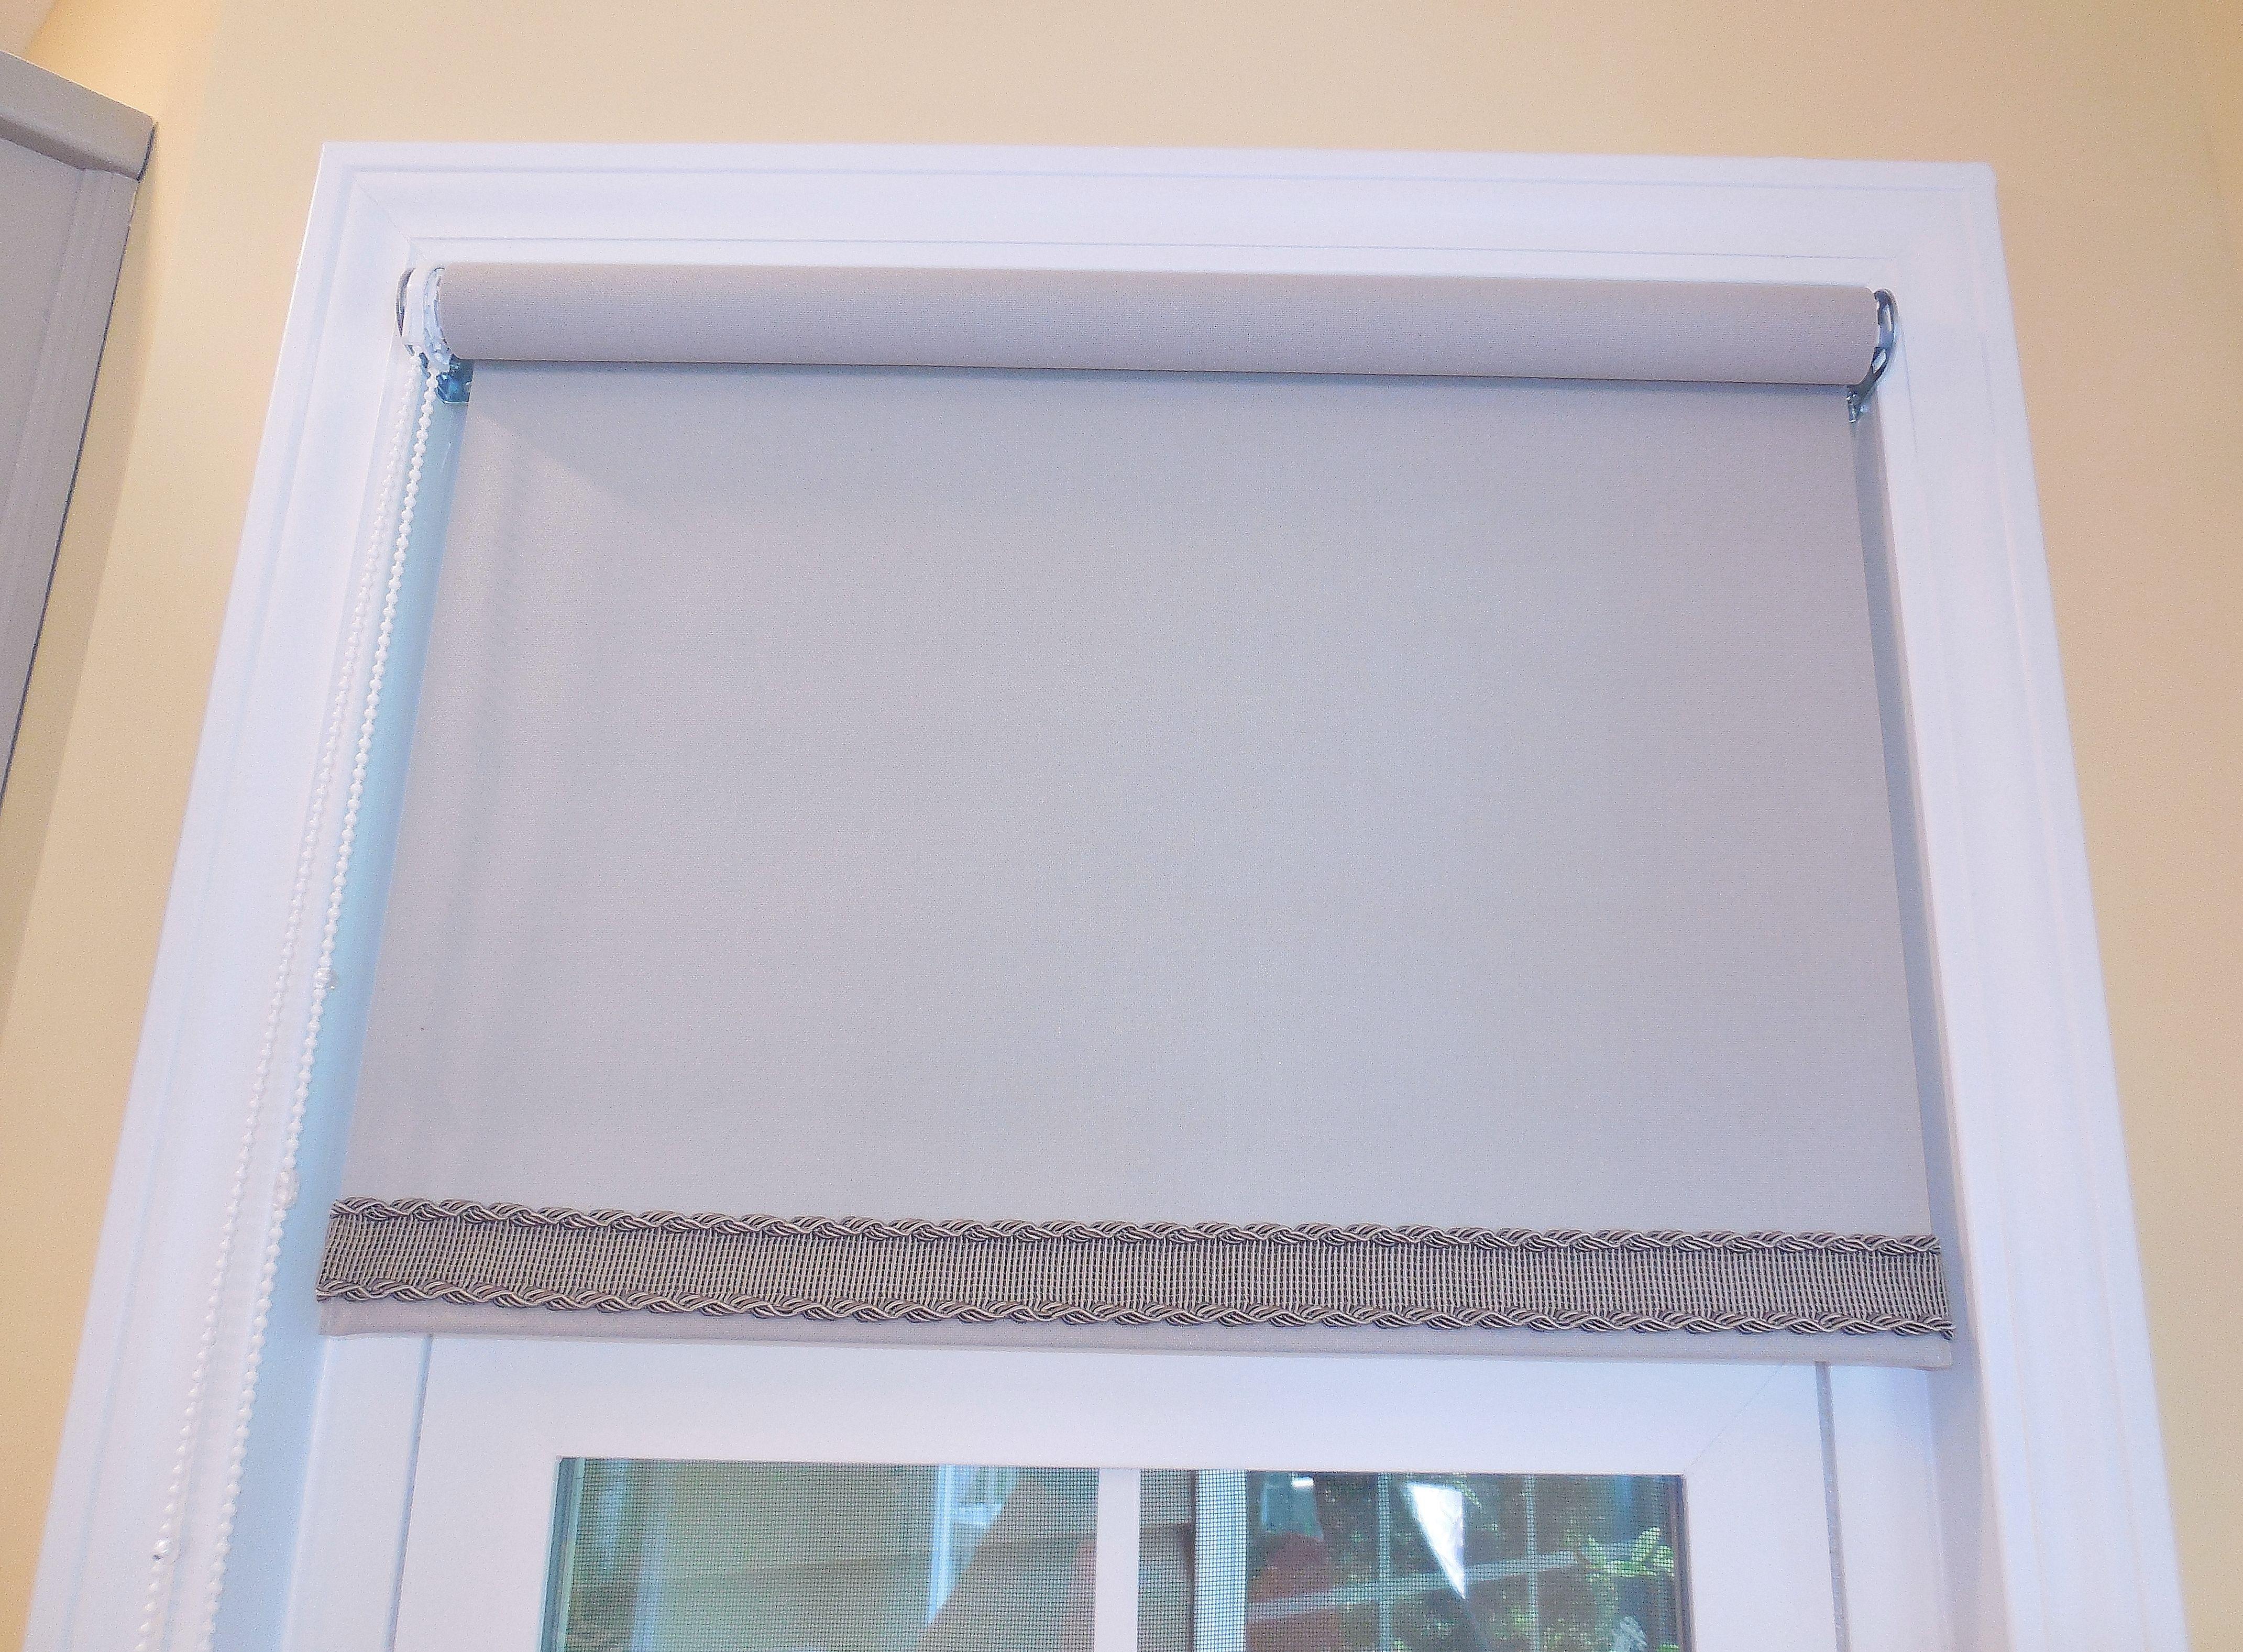 inc installation blinds room oakville windows portfolio toronto interior shutters doors perfect coverings view fasada treatment window covering burlington shades darkening